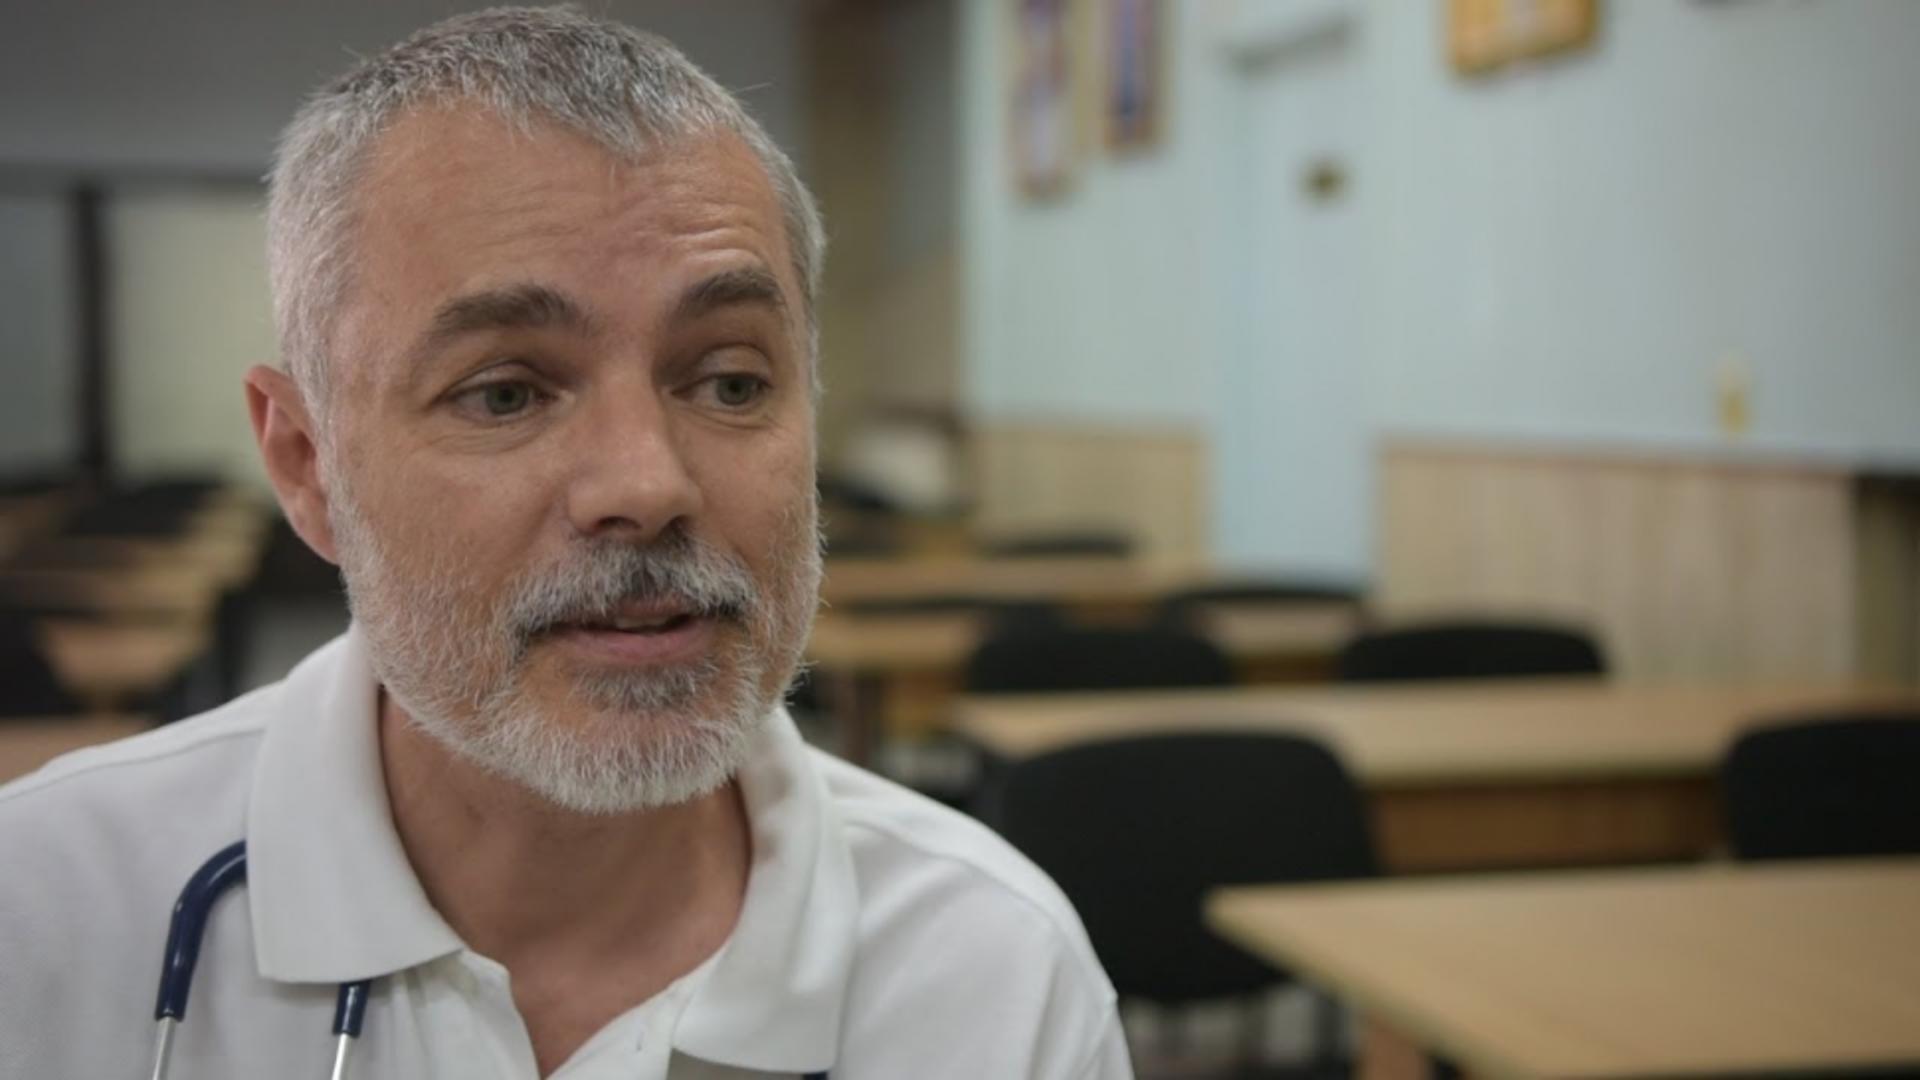 Mihai Craiu